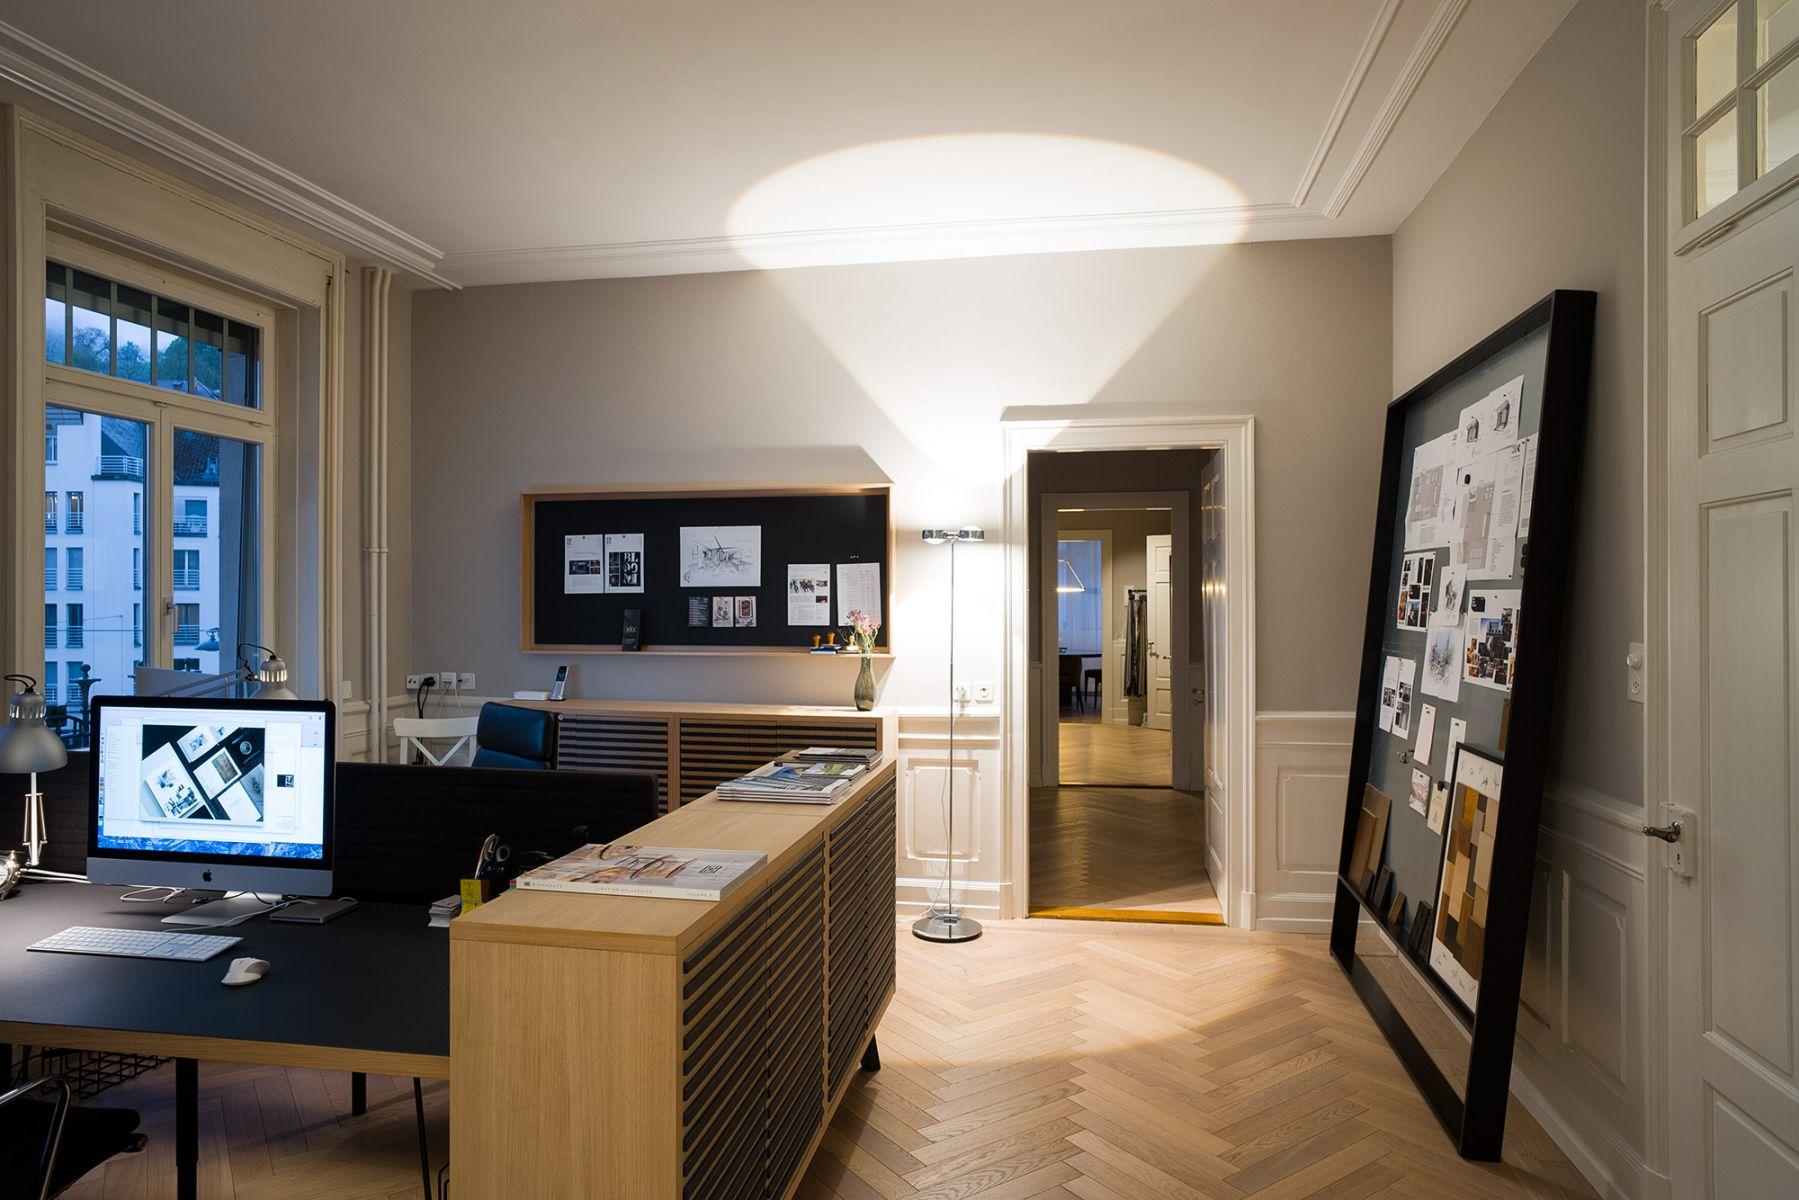 Büro Innenarchitektur innenarchitektur moritz hillebrand